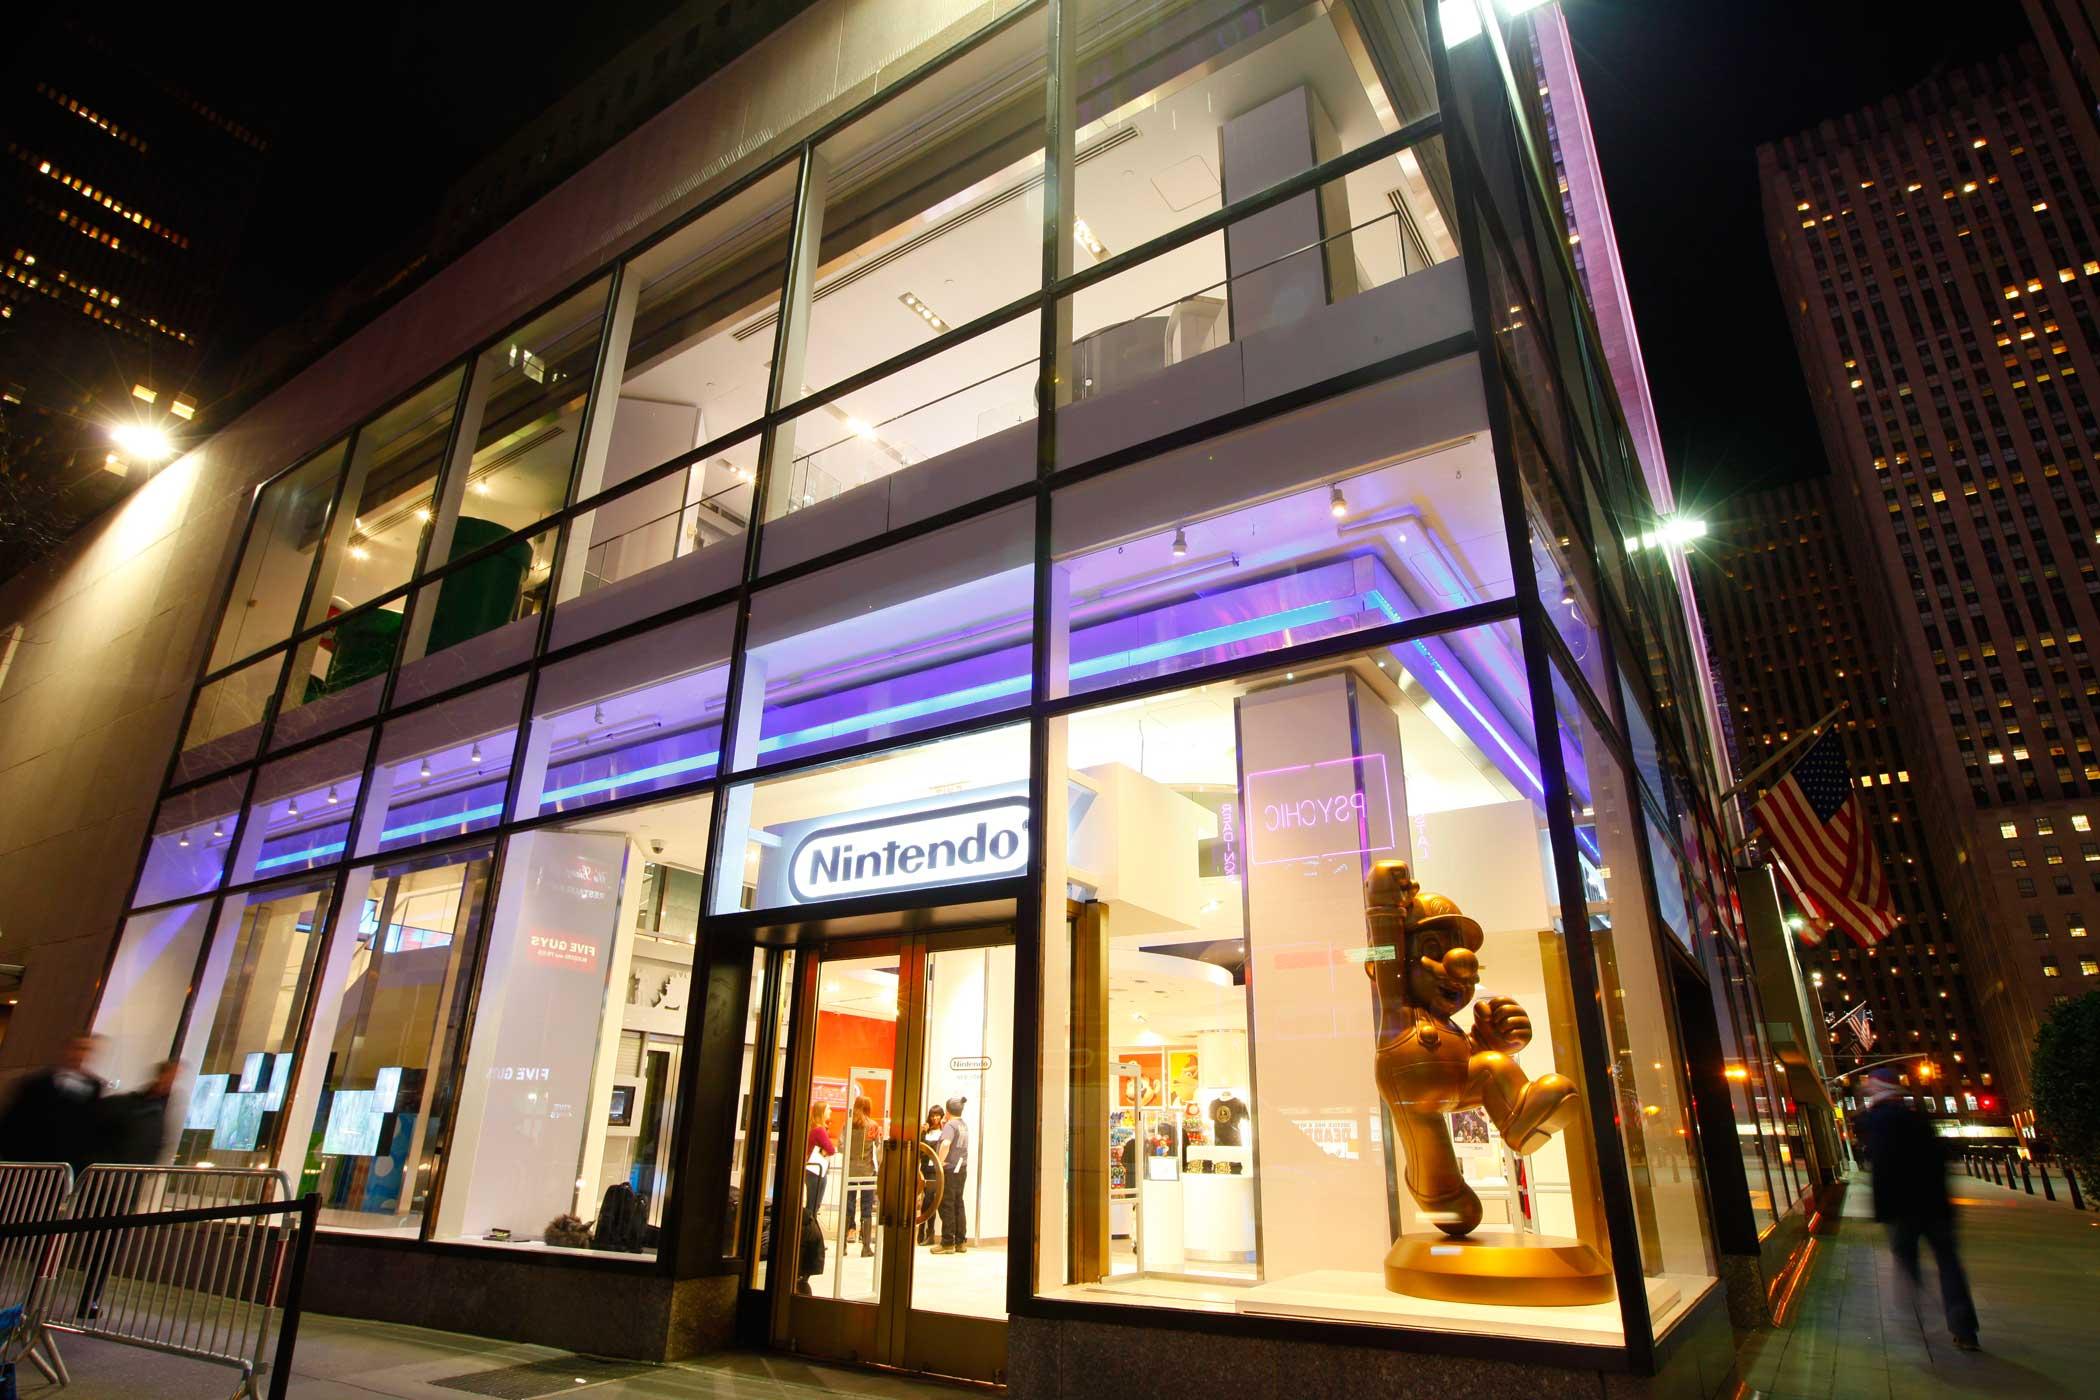 Nintendo New York, Nintendo's flagship store the night before opening. Feb. 19, 2016 in New York.